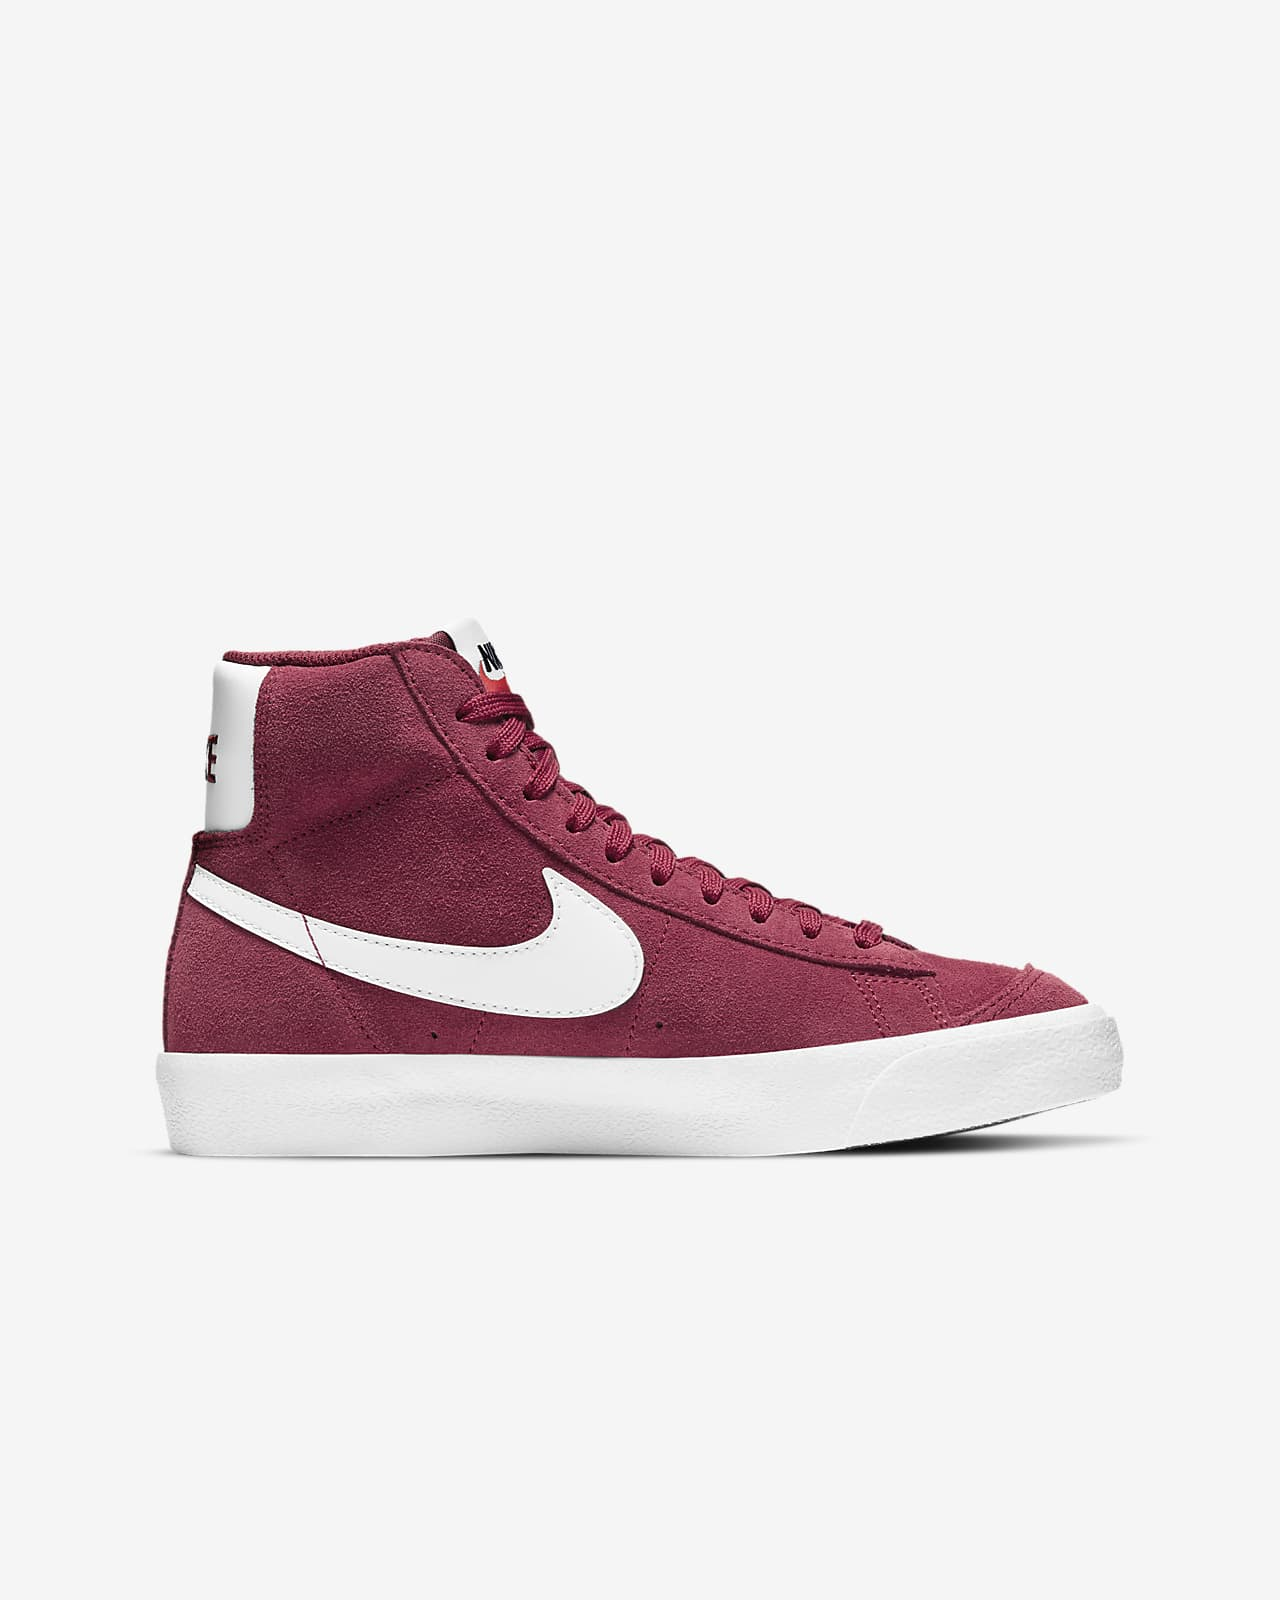 Nike Blazer Mid '77 Suede Older Kids' Shoe. Nike LU